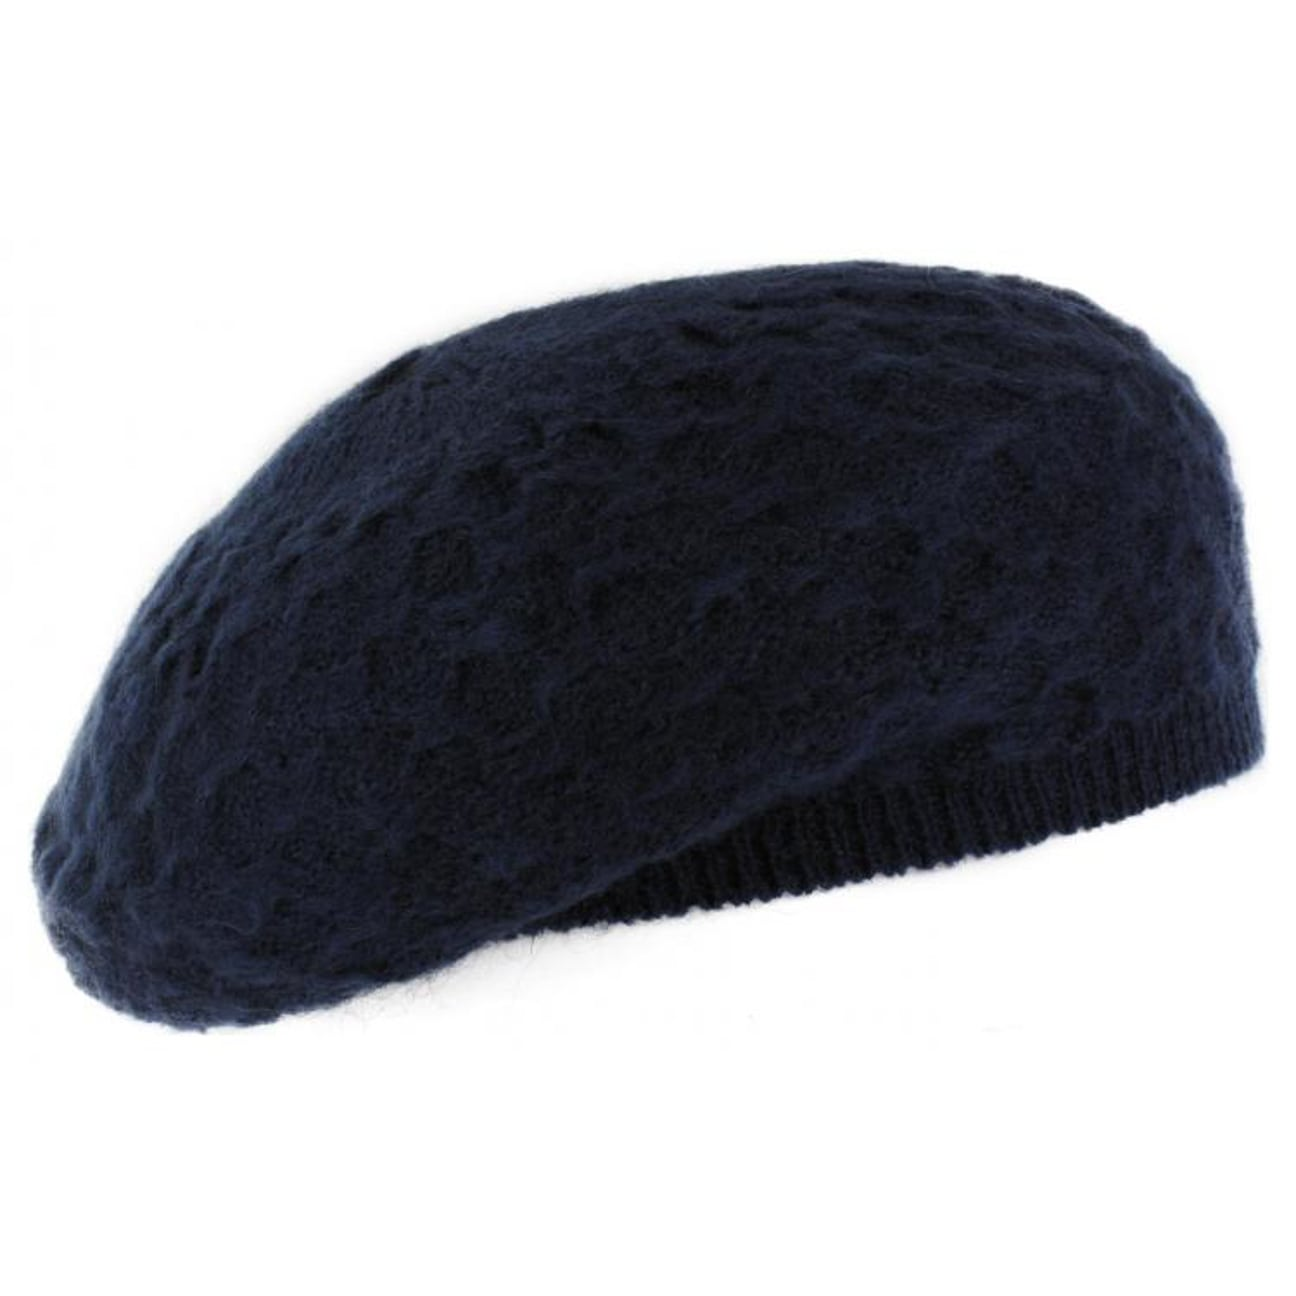 Niokolo Mohair Knit Beret by McBURN, EUR 14,95 --> Hats, caps & beanie...